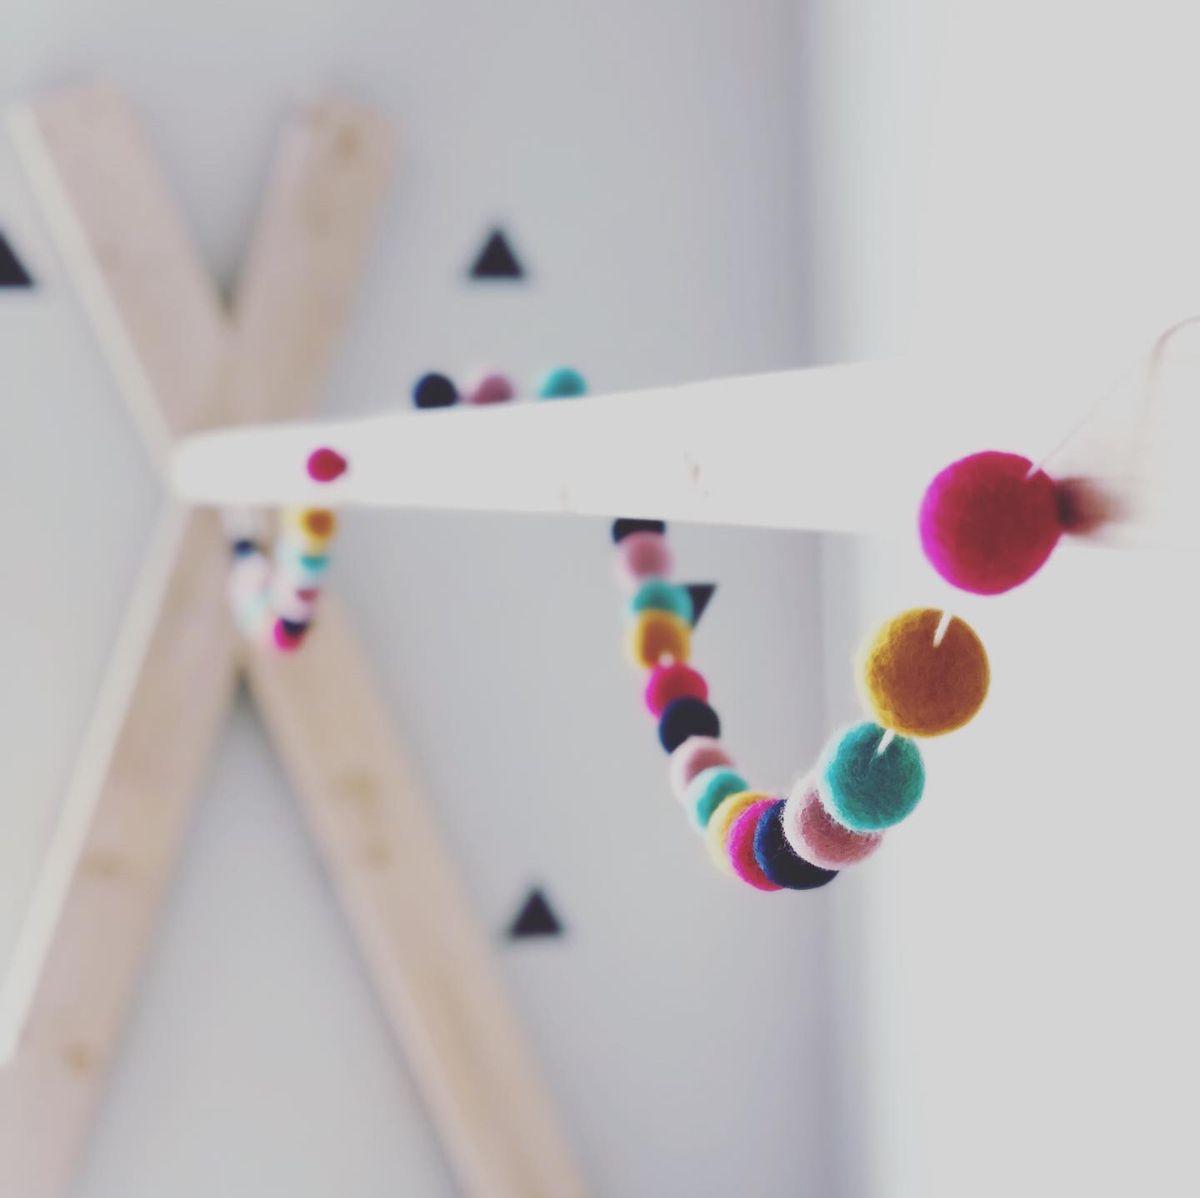 #woolballs #teepee #kidsbed #scandinavian #kidsdecor #rainbow  #triangles